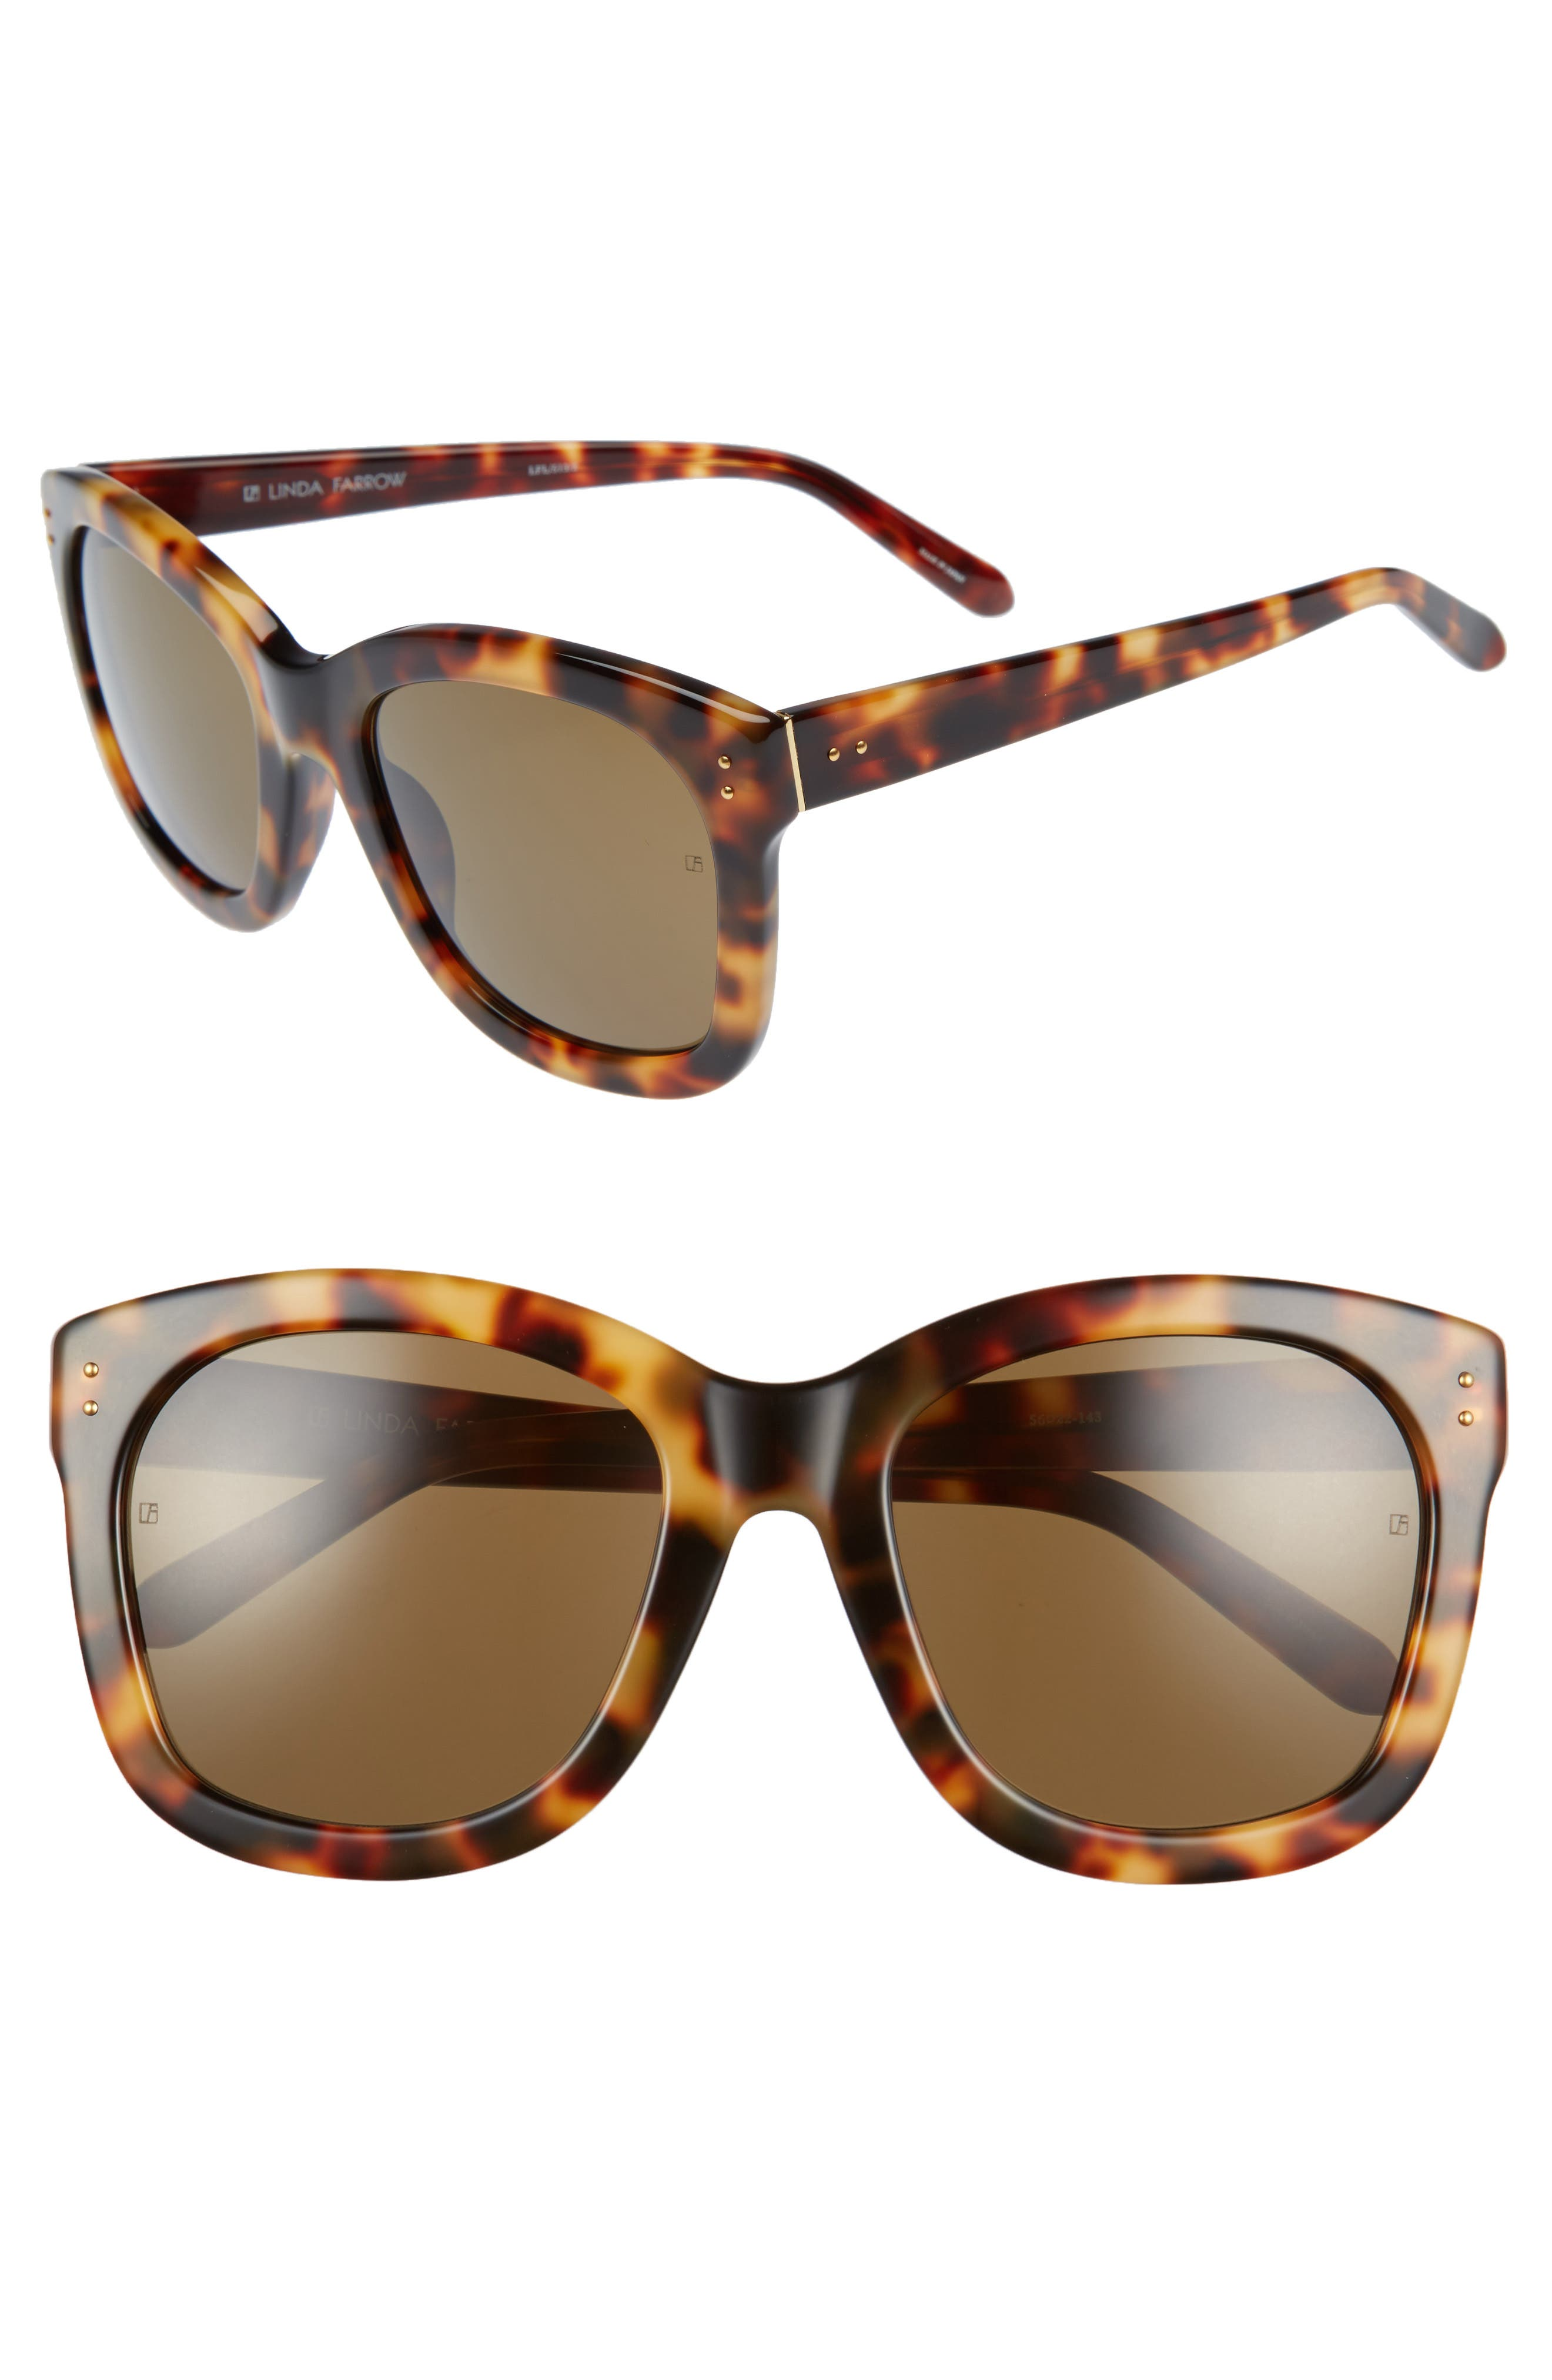 56mm Angular Sunglasses,                         Main,                         color, Tortoise/ Yellow Gold/ Brown